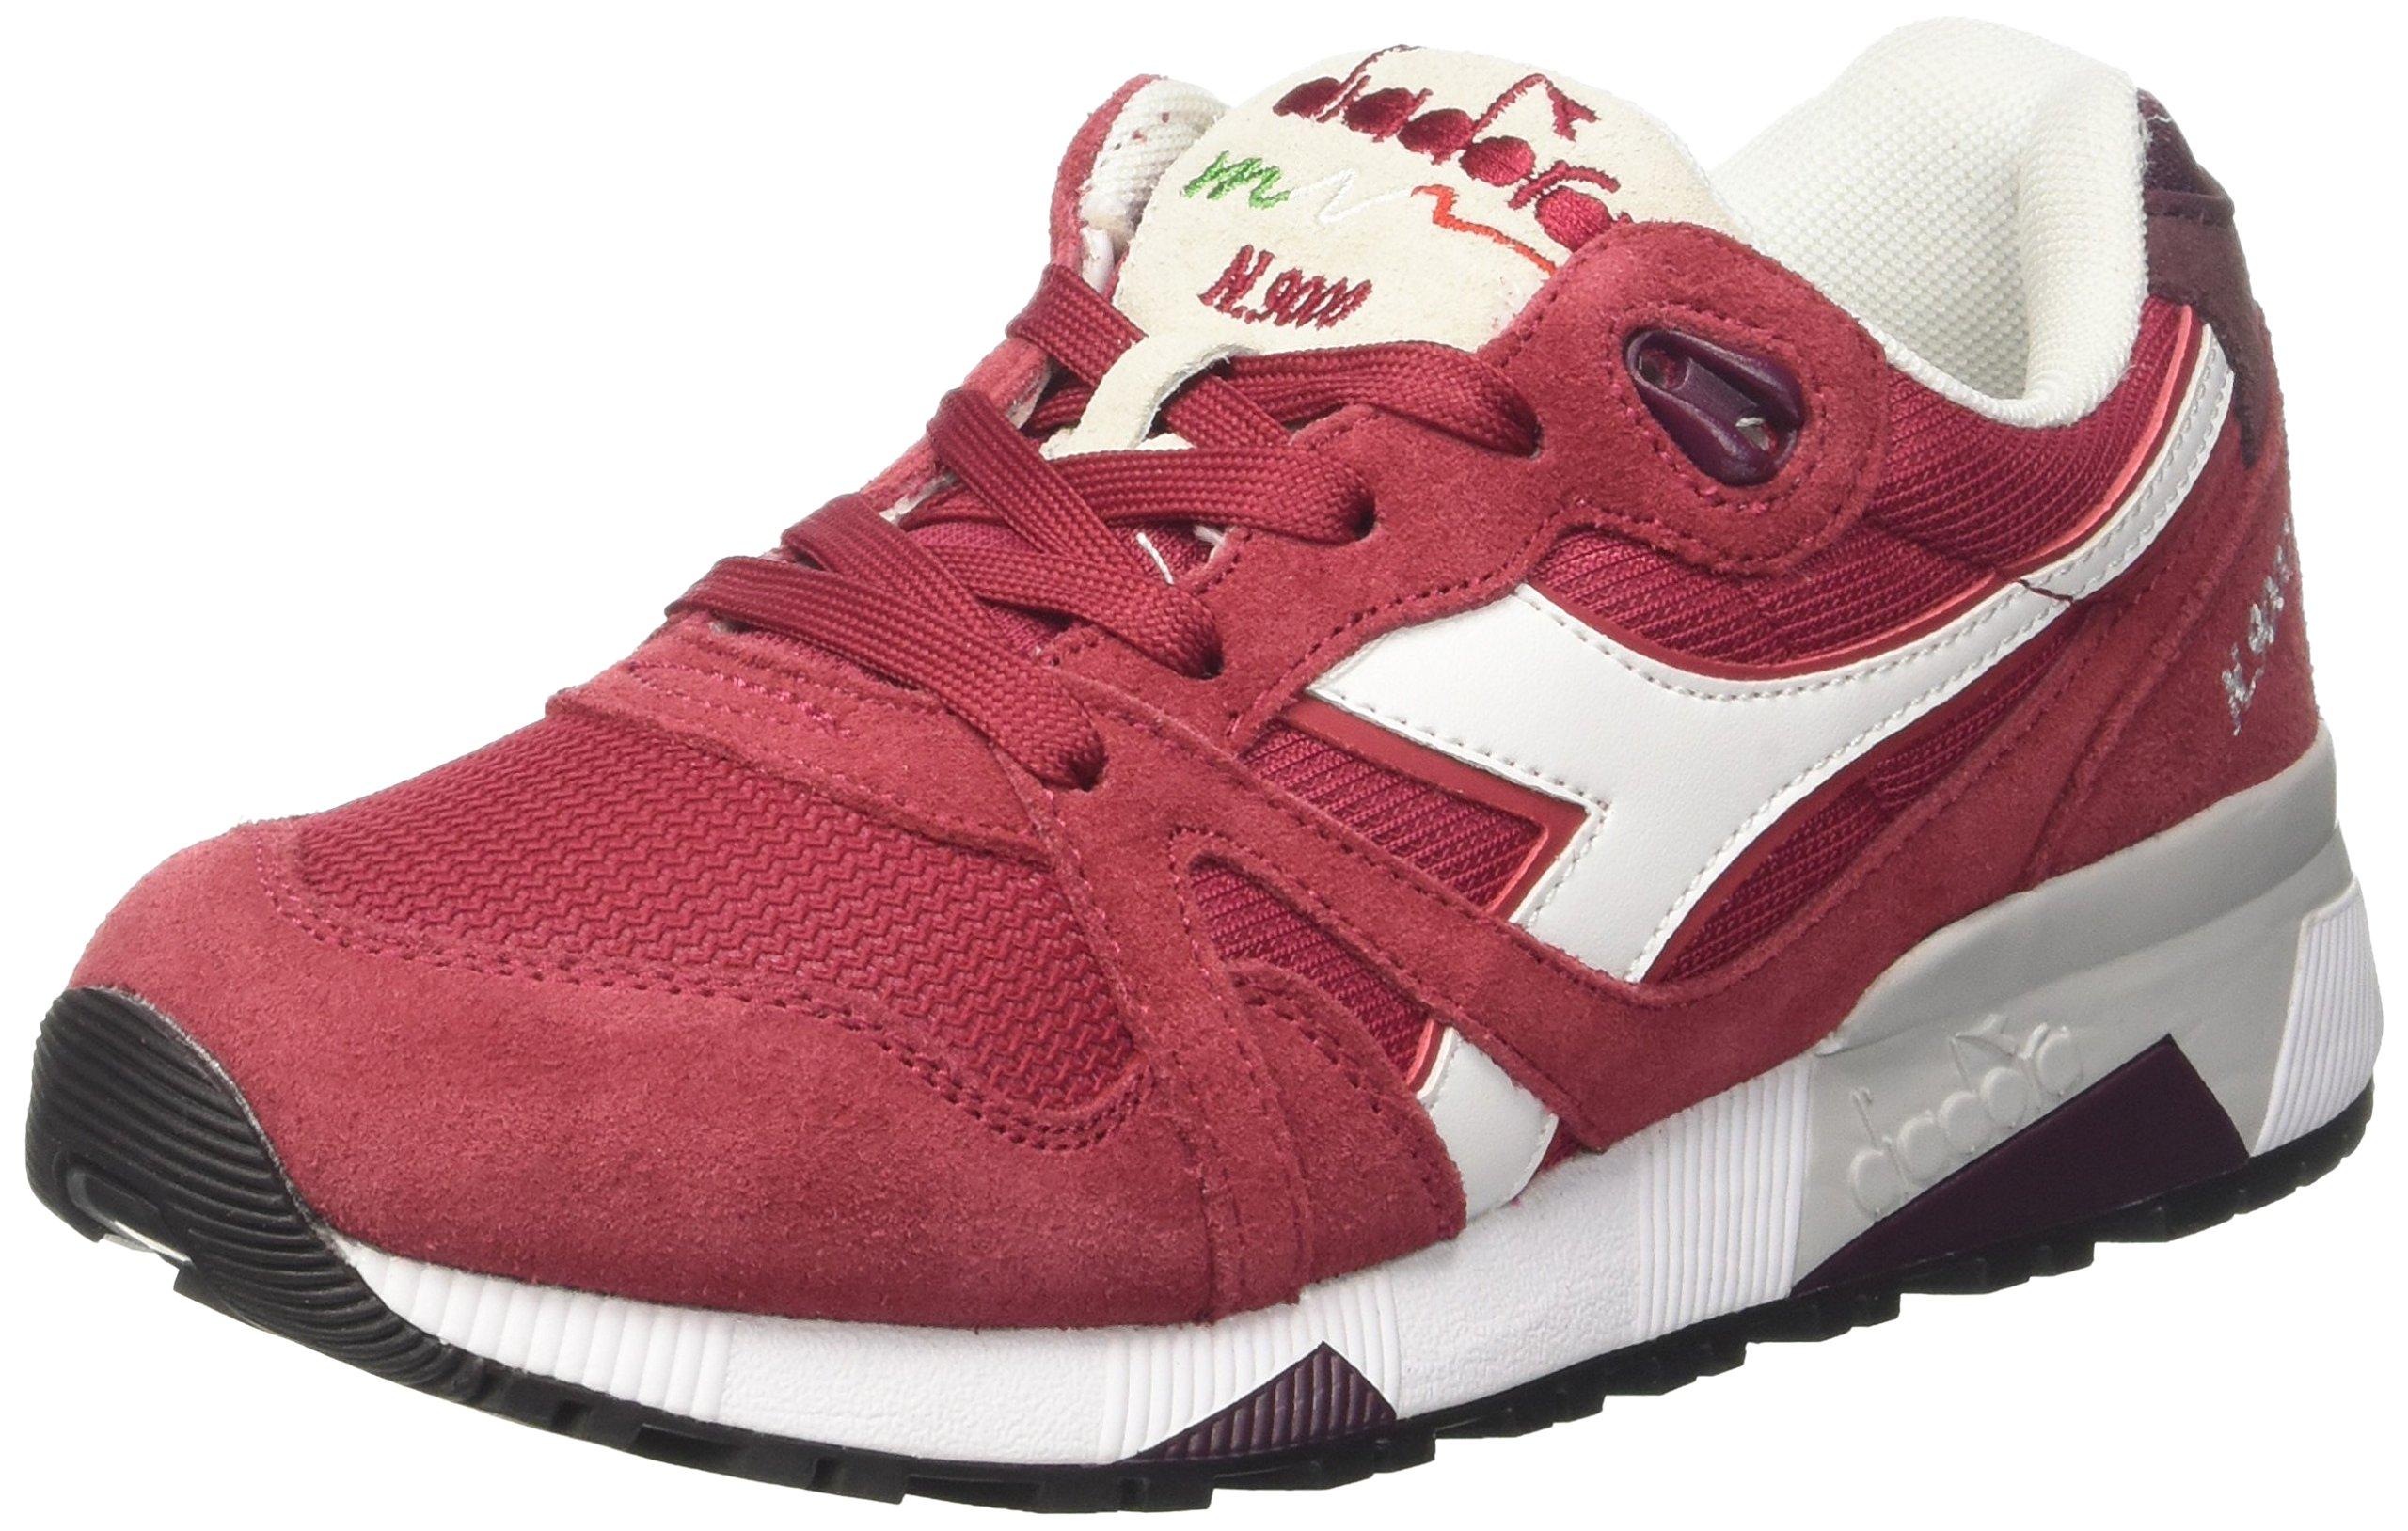 IiiSneaker 5 Diadora Mixte Eu AdulteVioletviola N9000 Du Bottone40 Bas Cou TJul3FK1c5